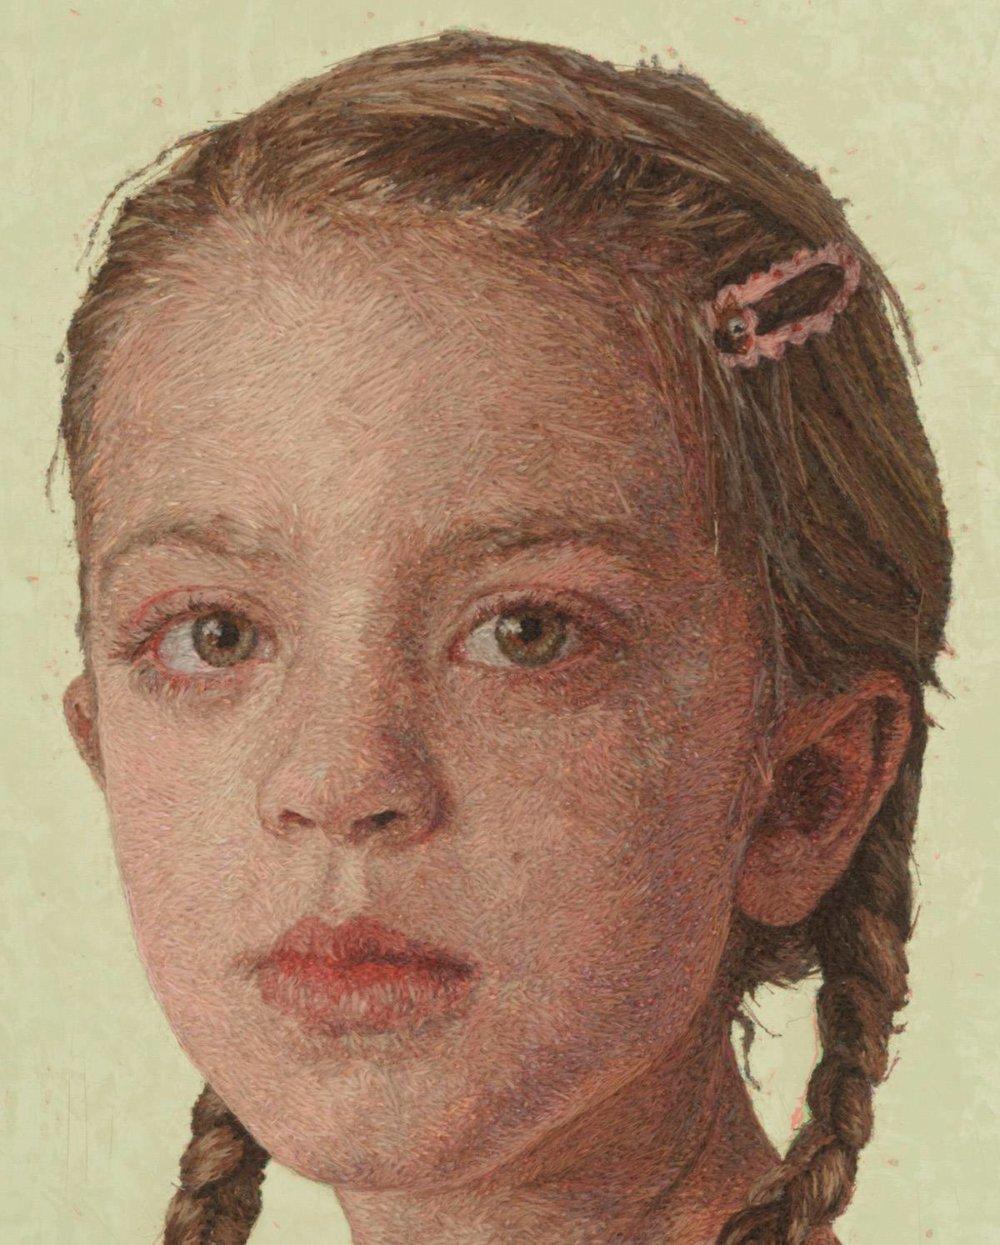 Realistic Embroidered Portraits By American Artist Cayce Zavaglia 6